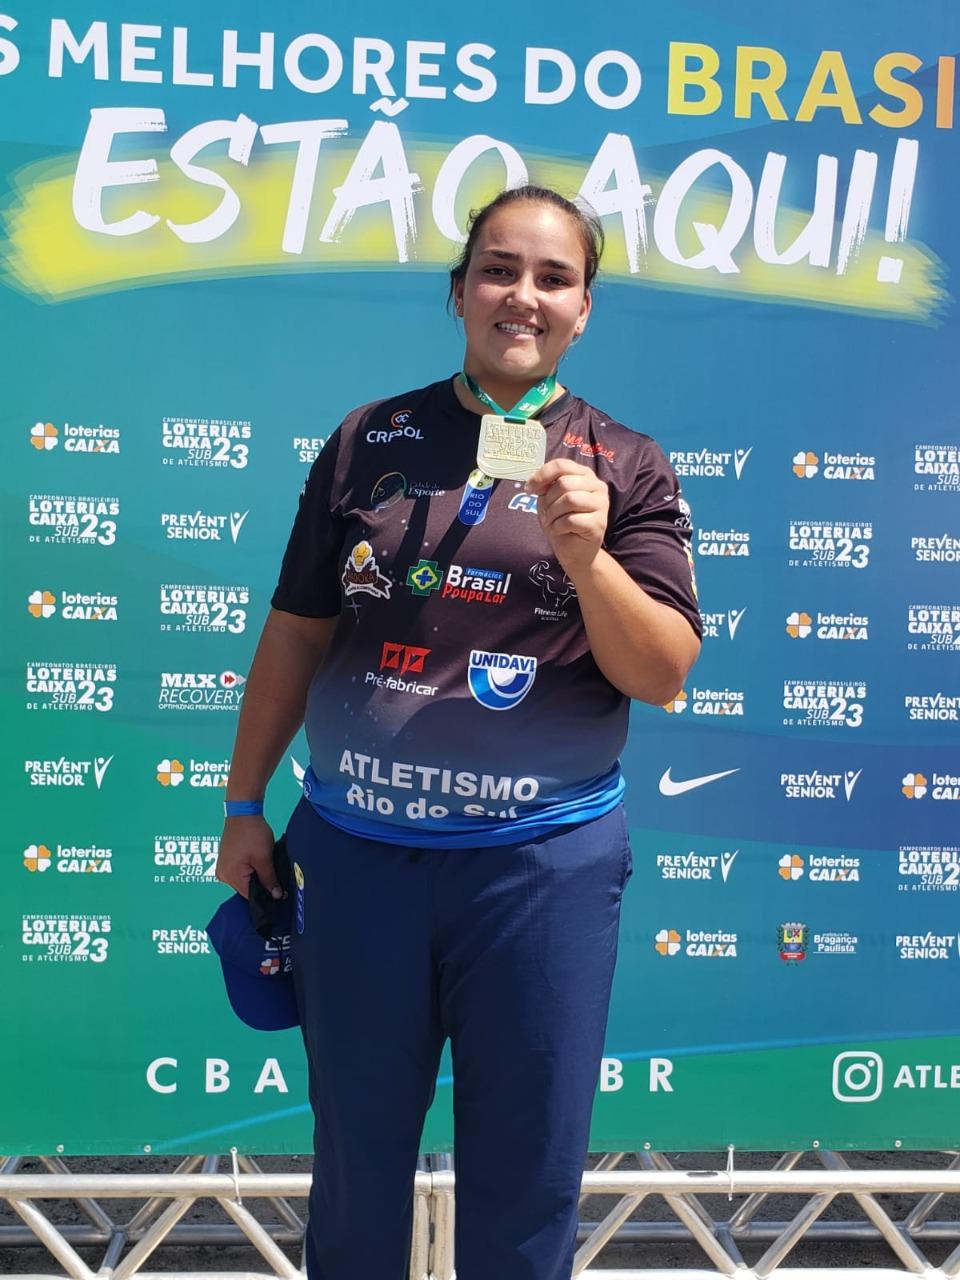 Milena Sens disputa Campeonato Sul-Americano de Atletismo Sub-23